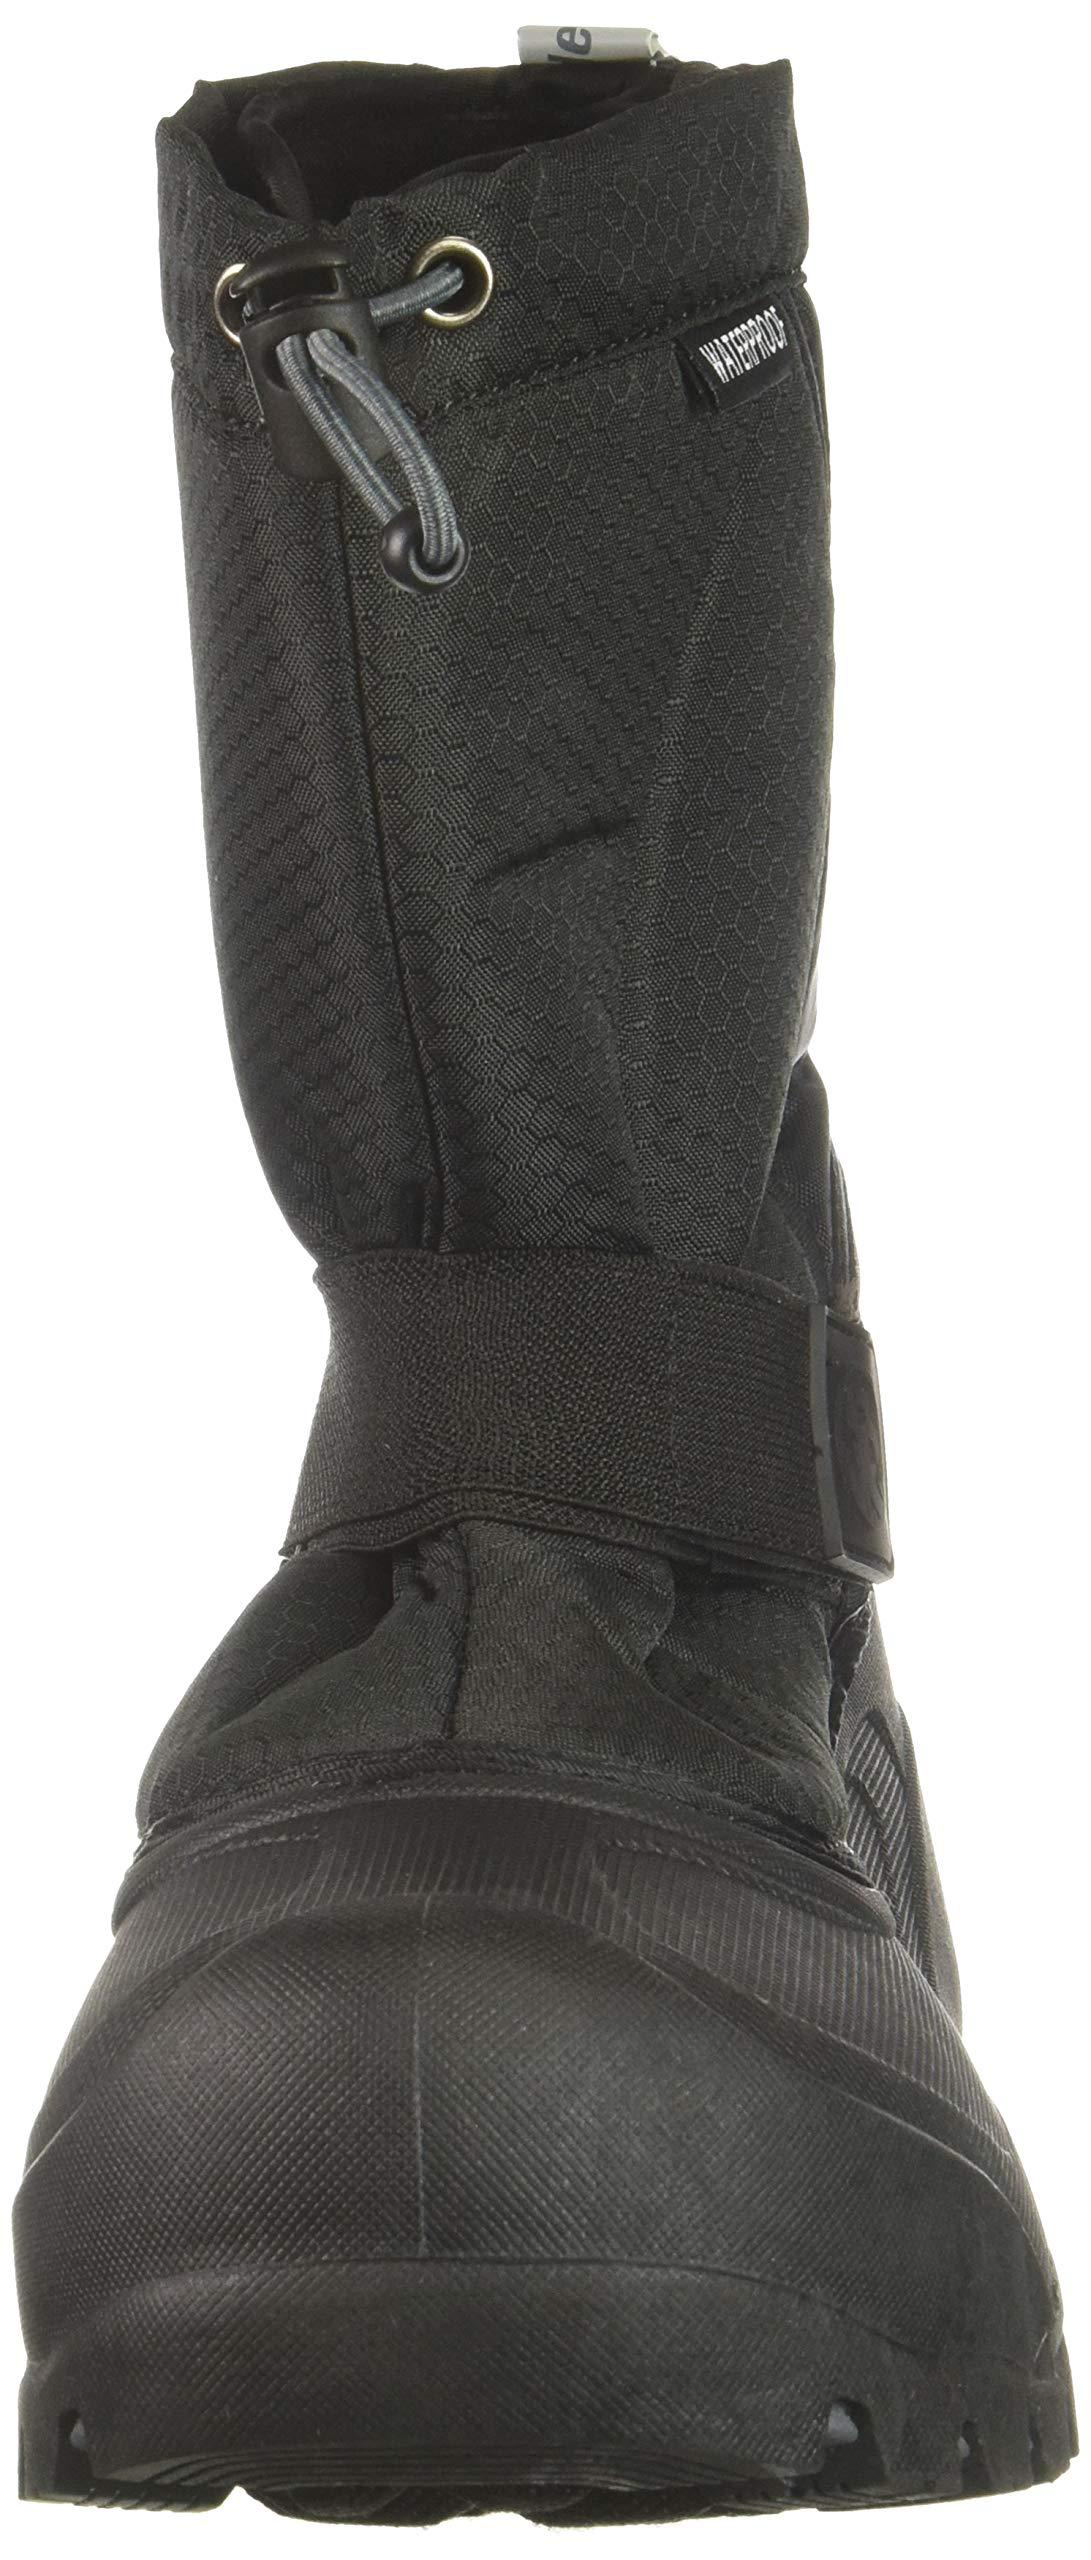 Northside Zephyr Snow Boot, Onyx, 6 Medium US Big Kid by Northside (Image #4)